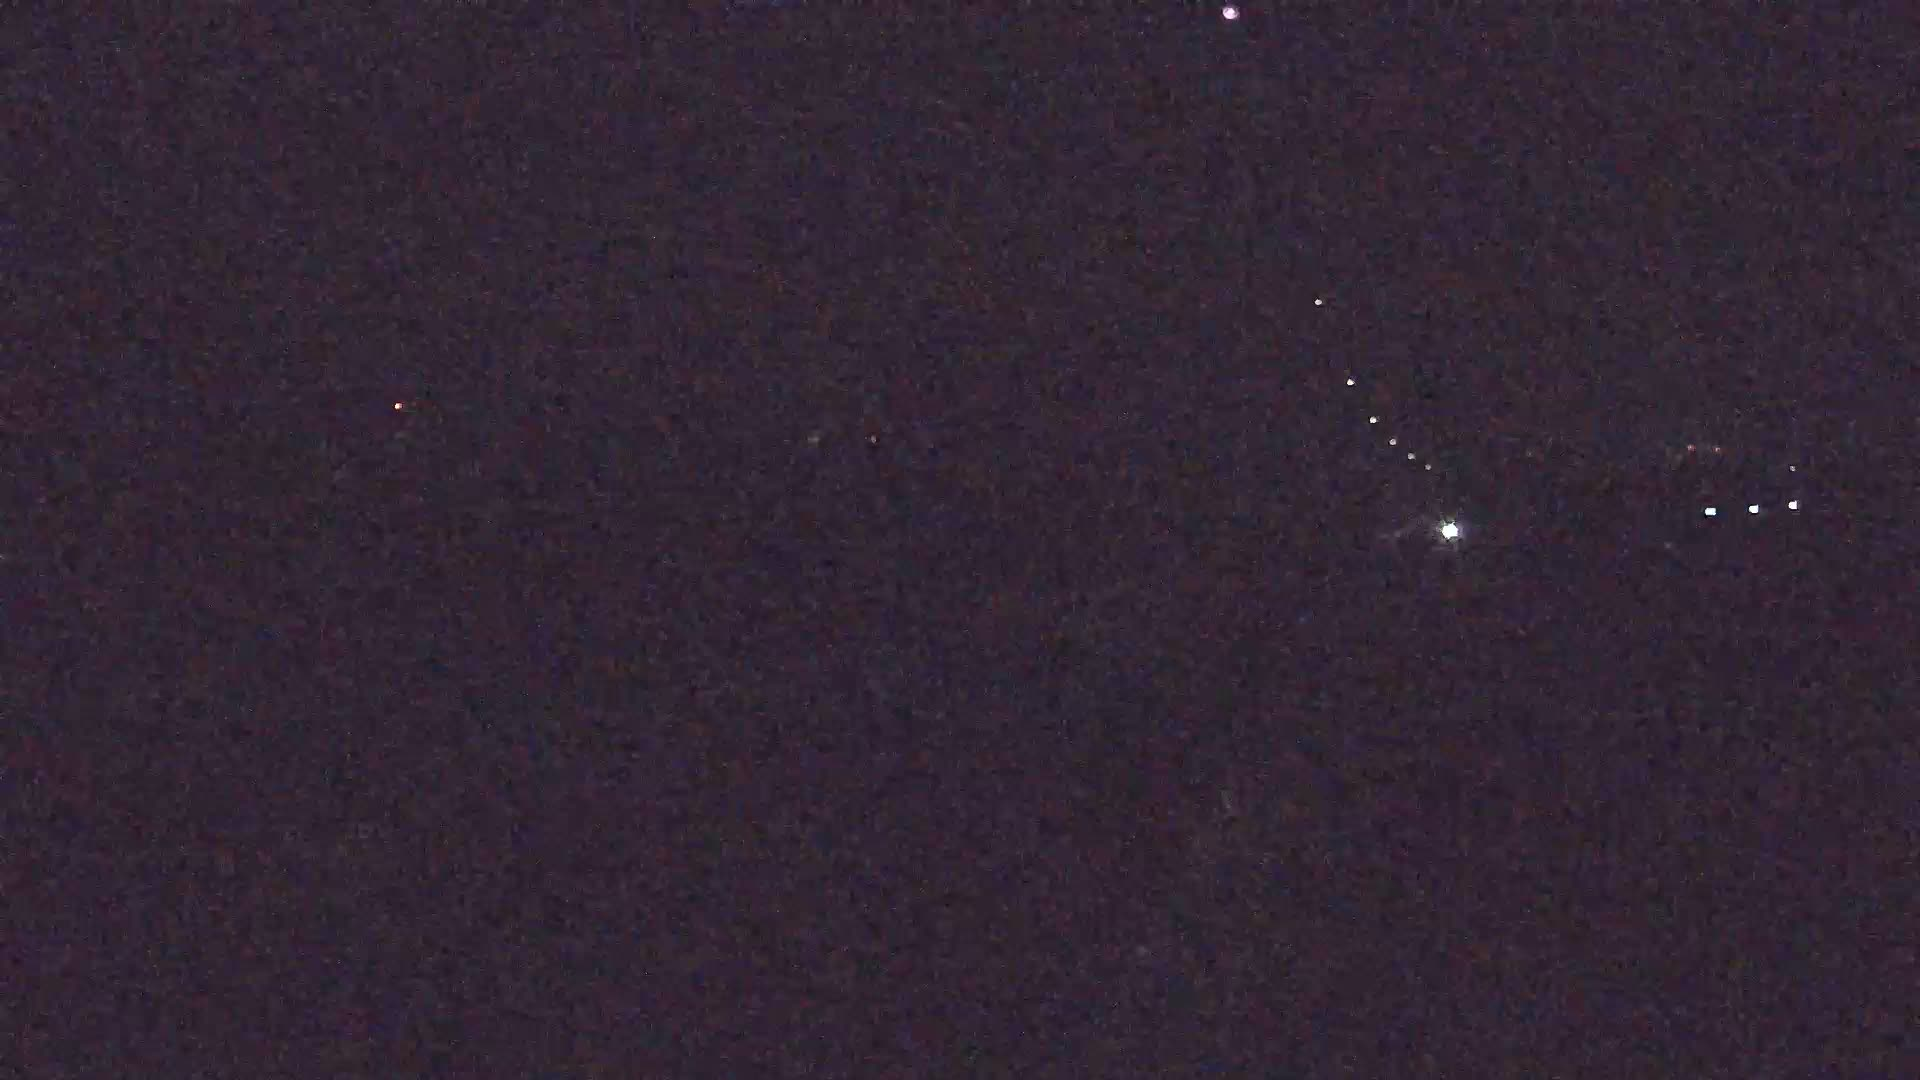 Millau Viaduct Wed. 02:47